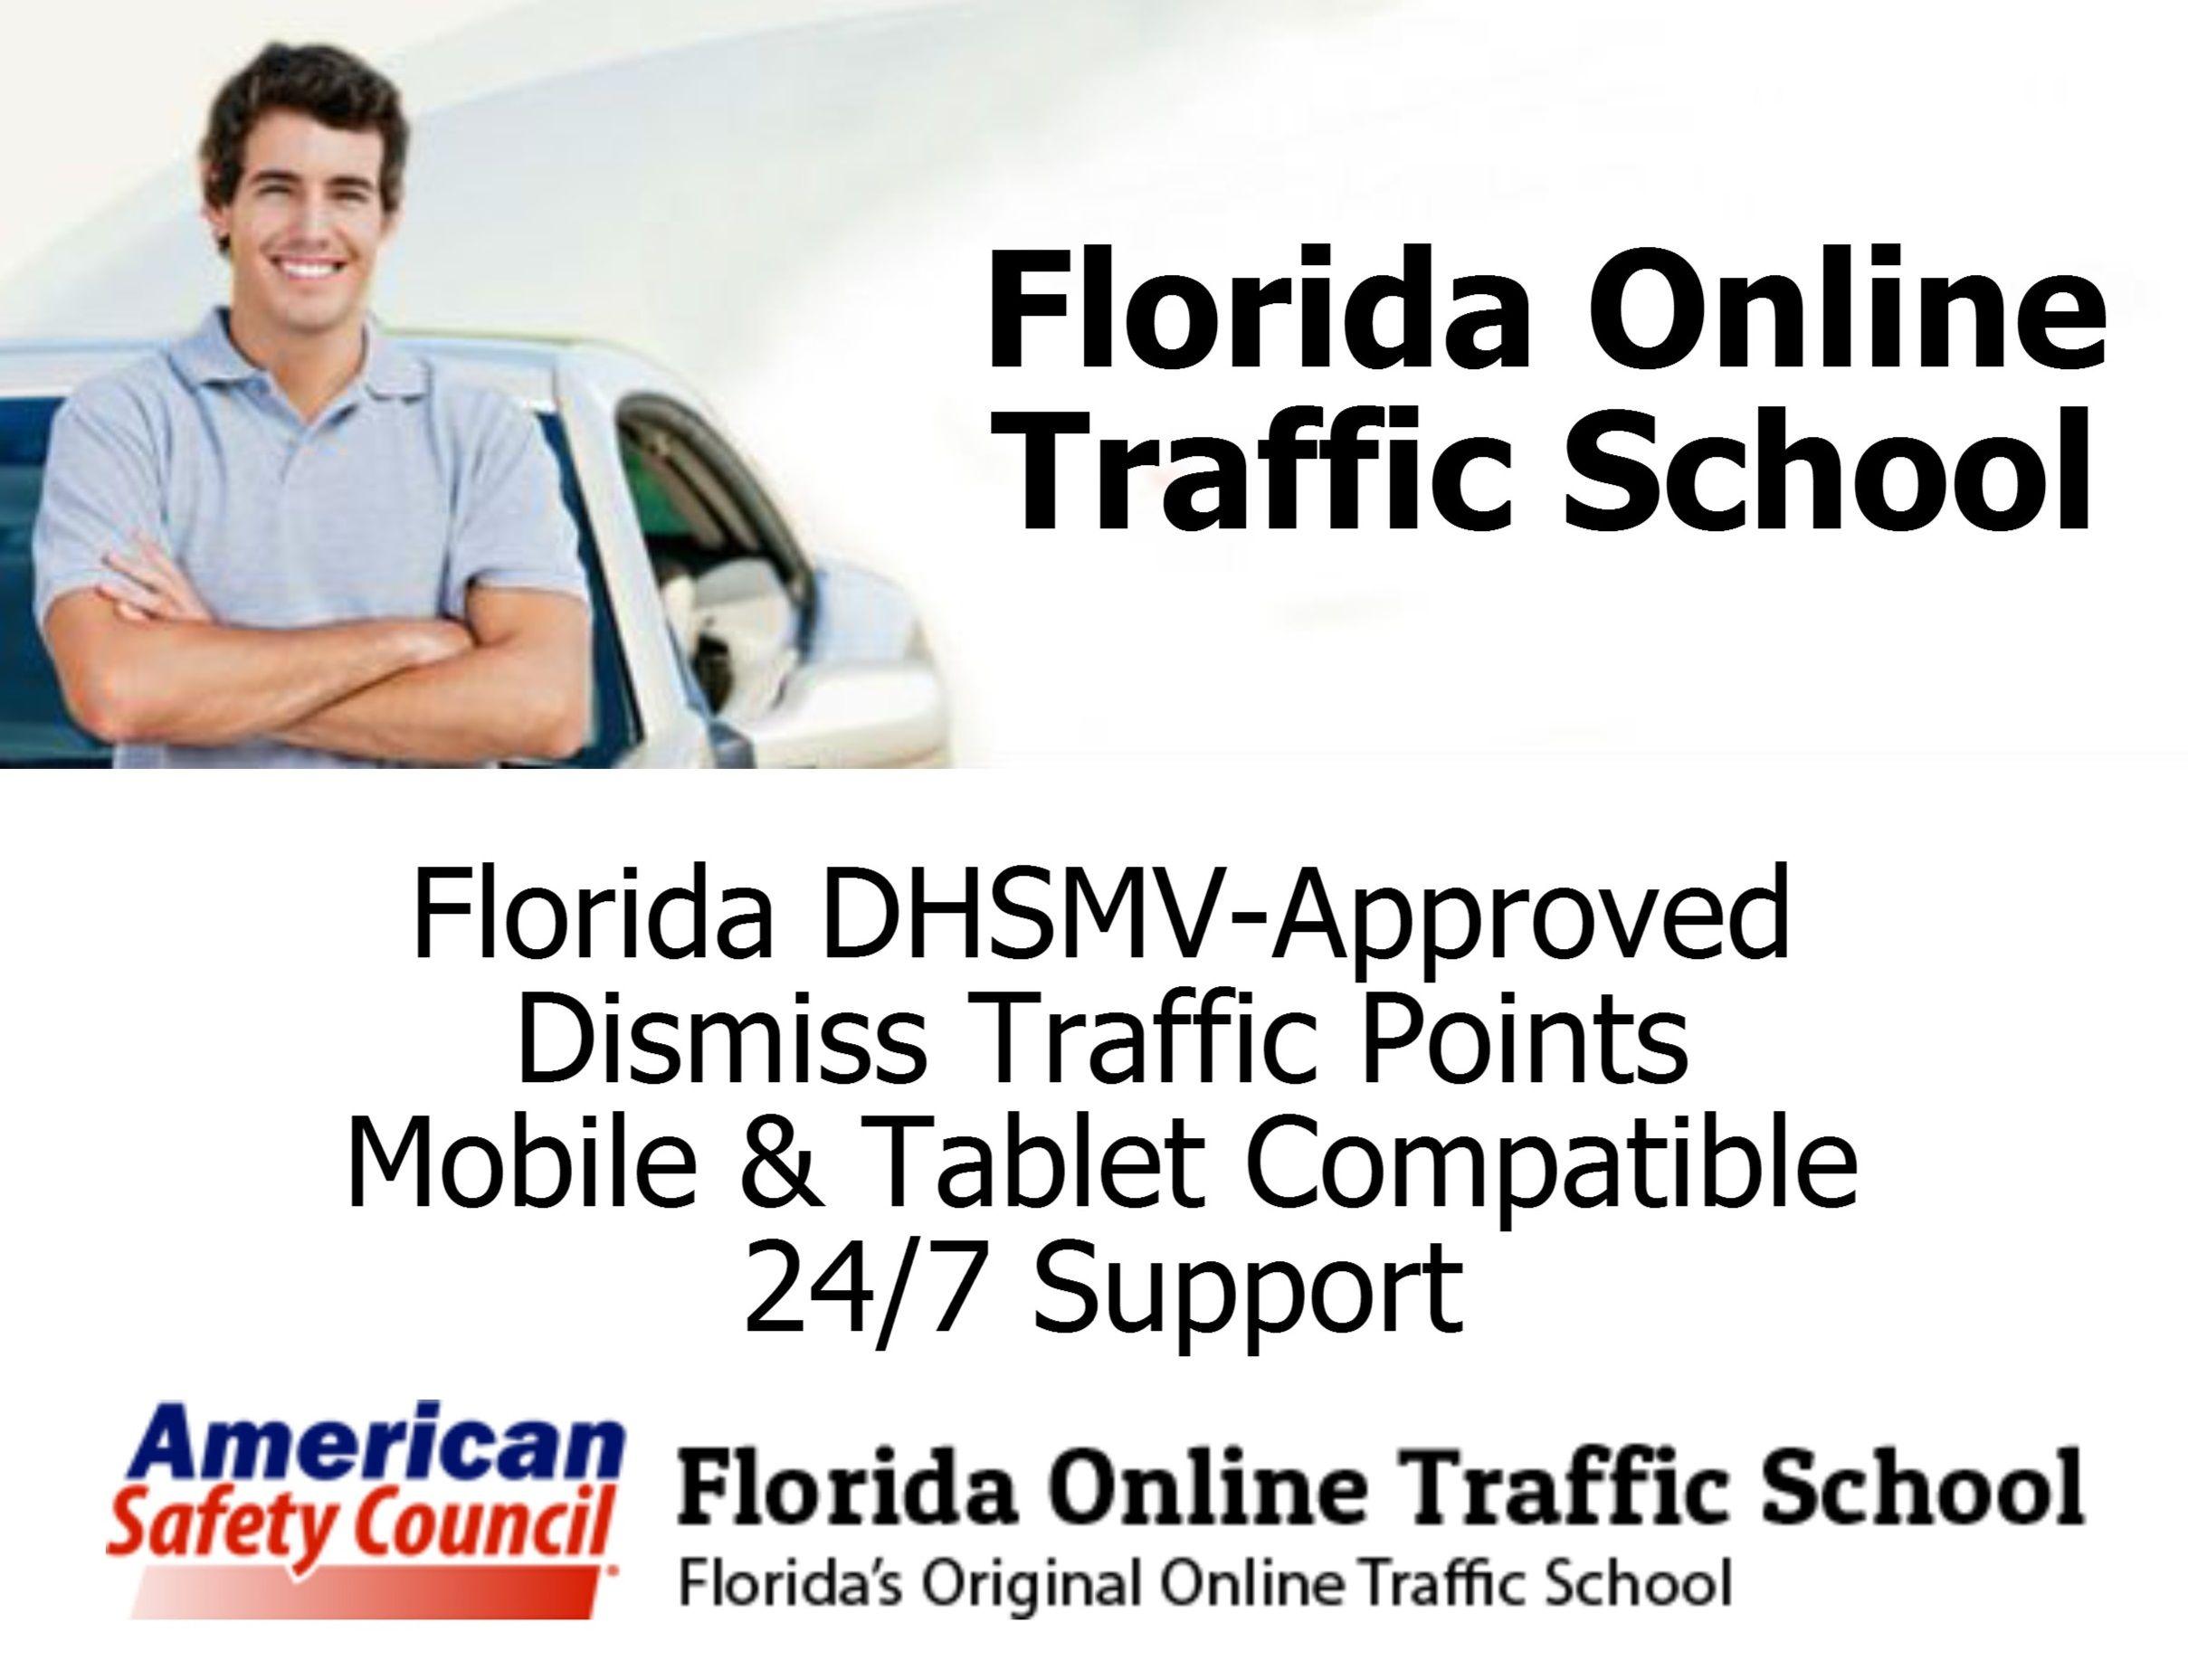 Floridaonlinetrafficschoolcom Elect To Take Florida Online